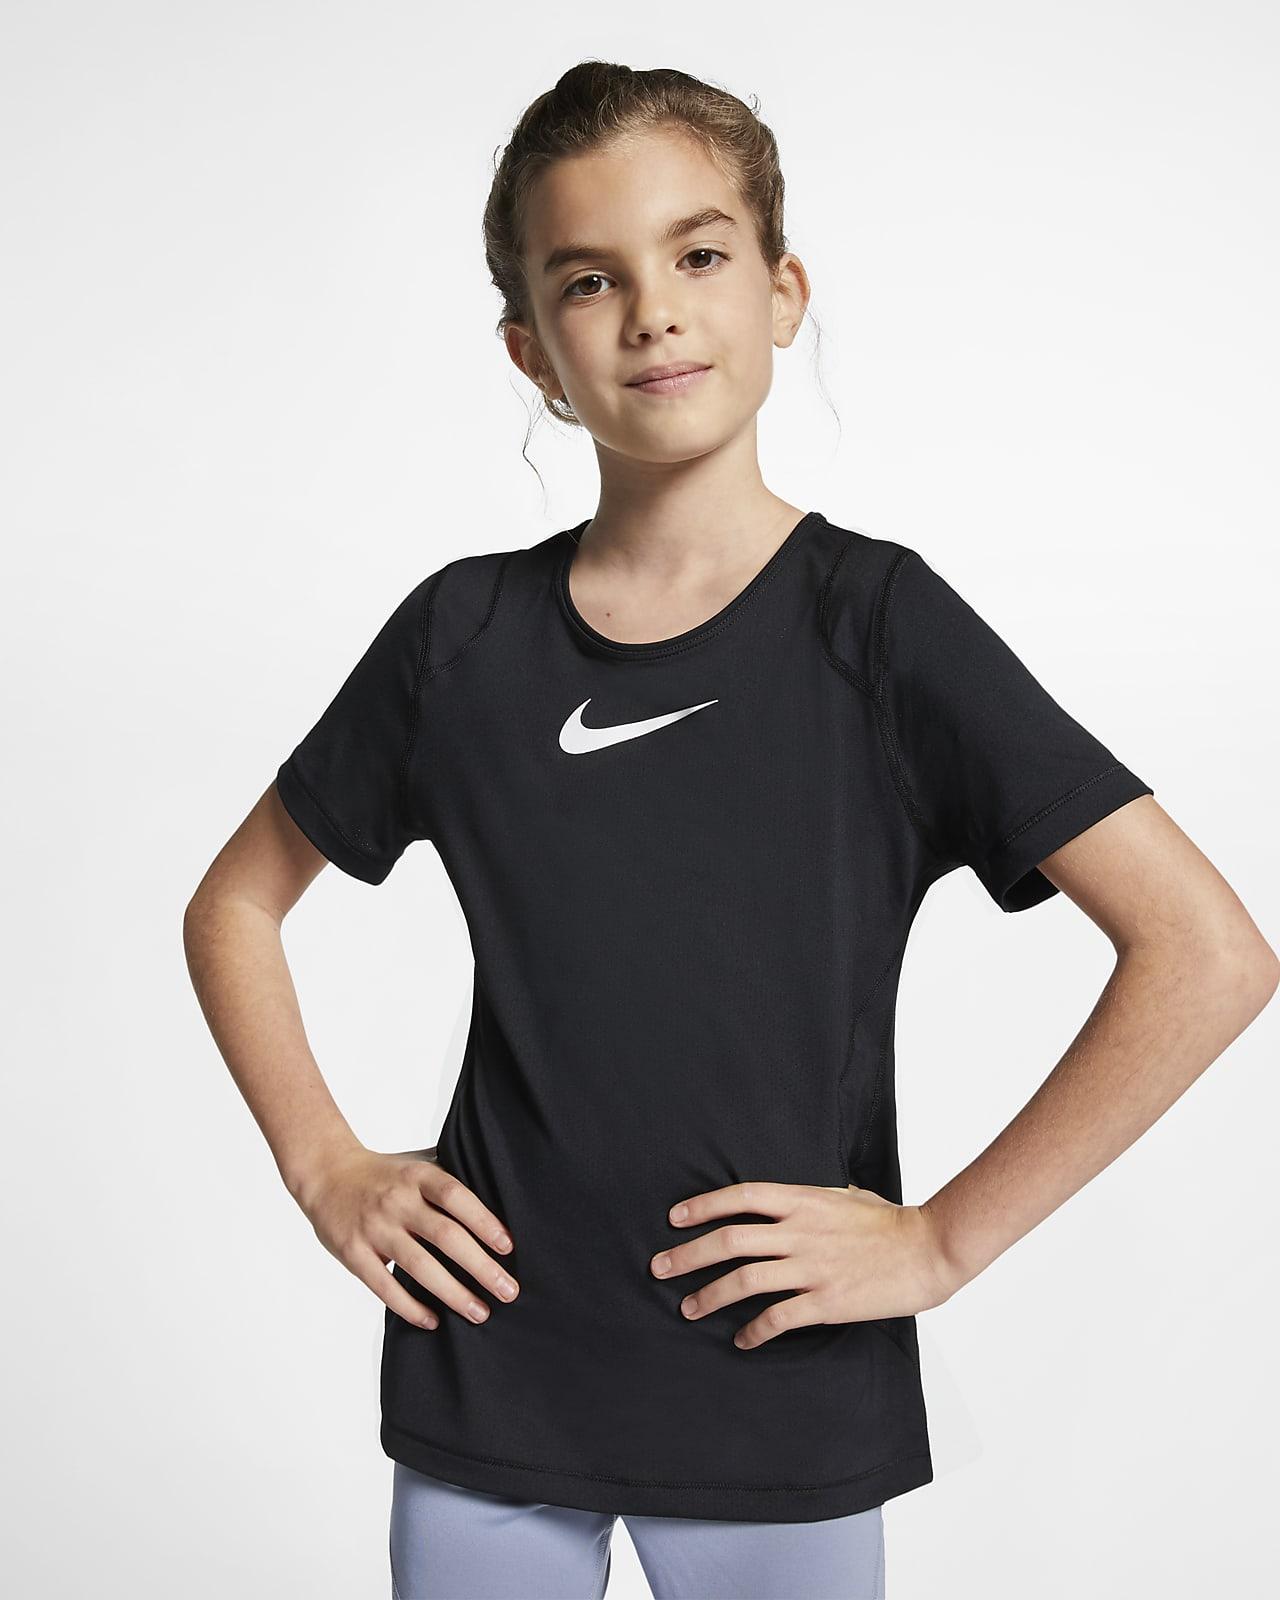 Nike Pro Big Kids' (Girls') Short-Sleeve Top